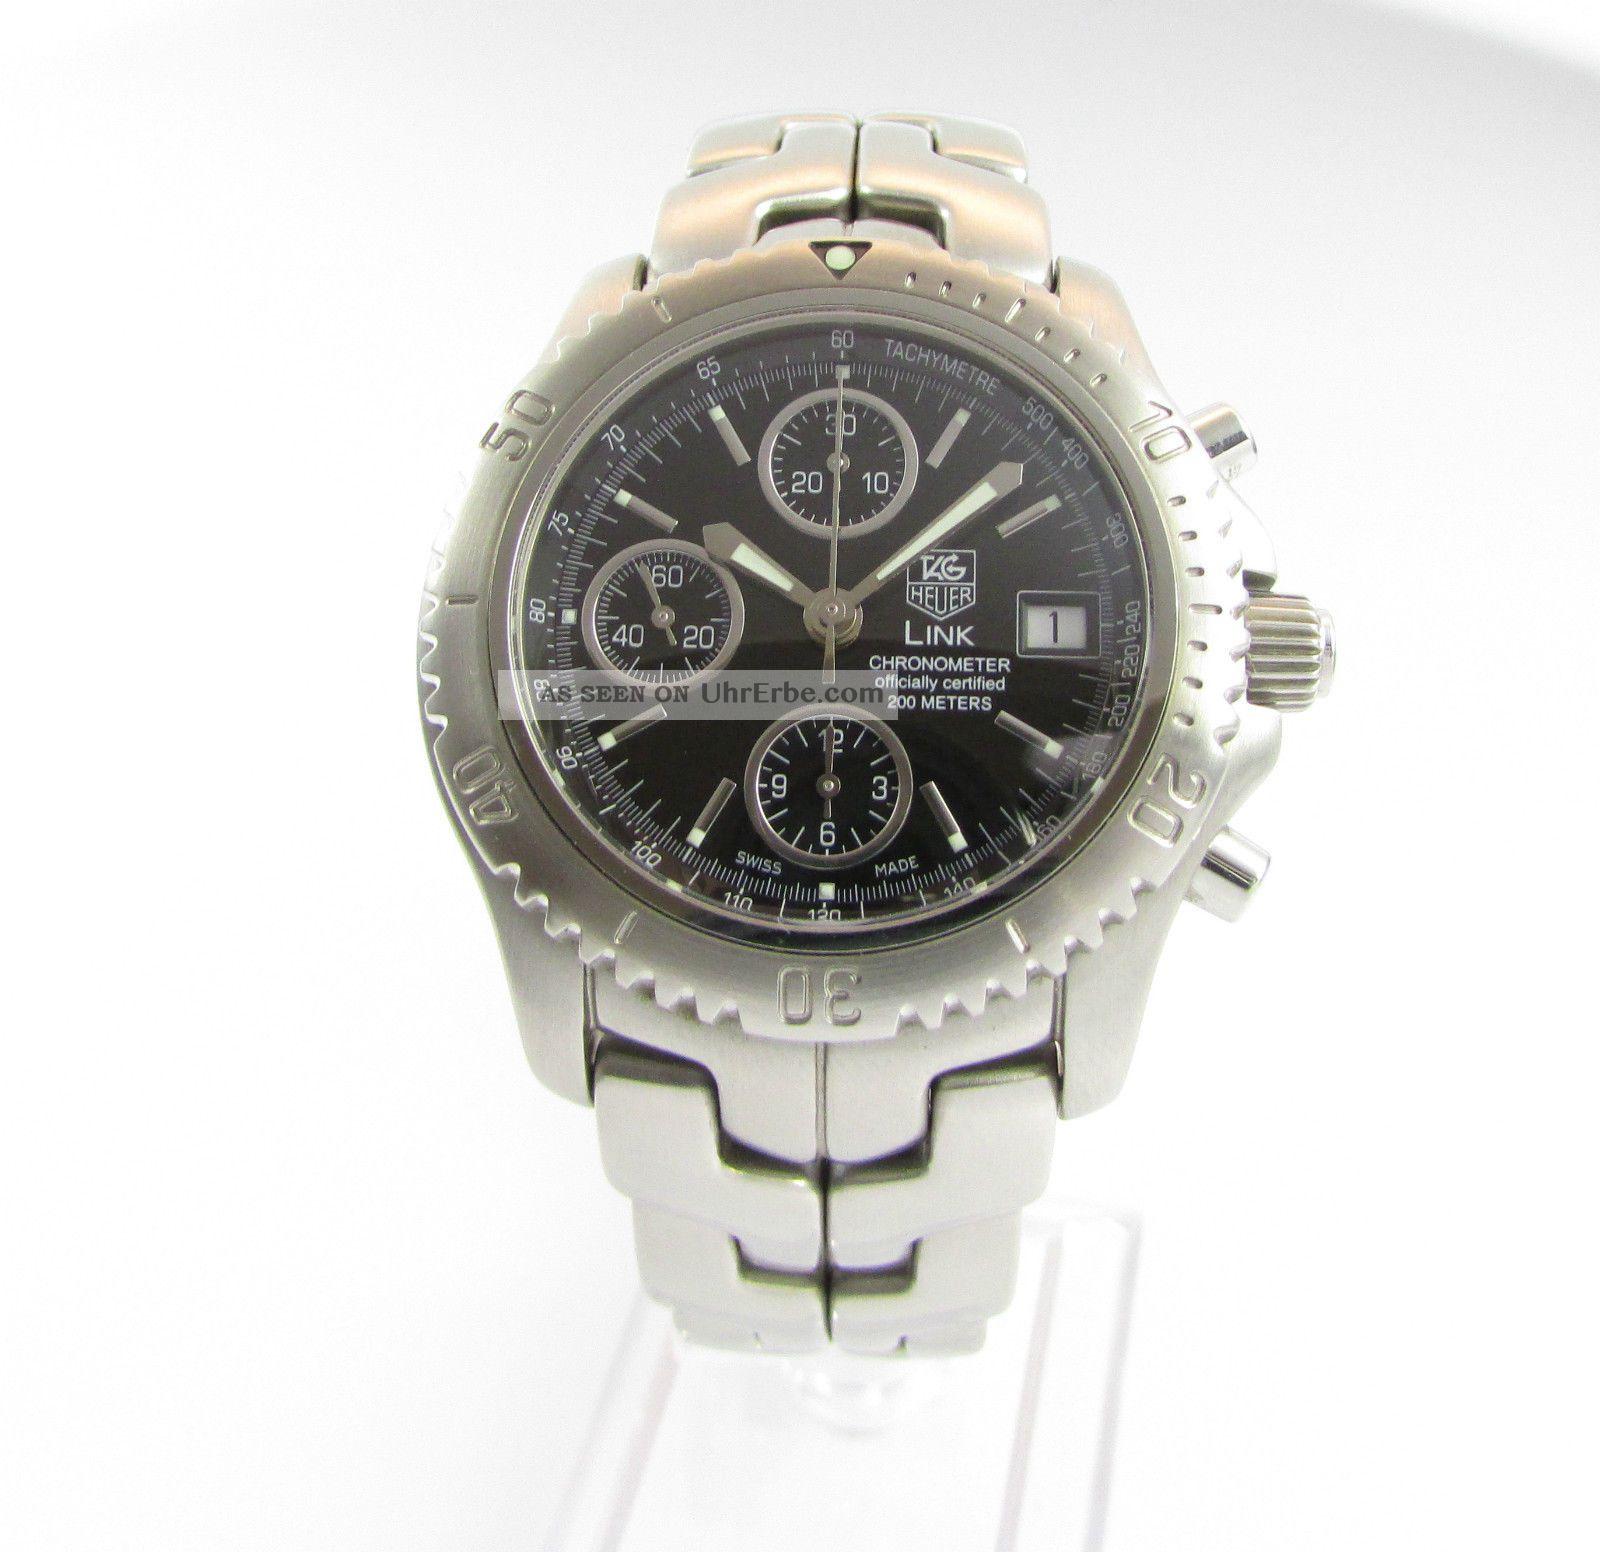 Tag Heuer Link Professional Automatik Chronograph - Seltene Chronometer Ausführung Armbanduhren Bild